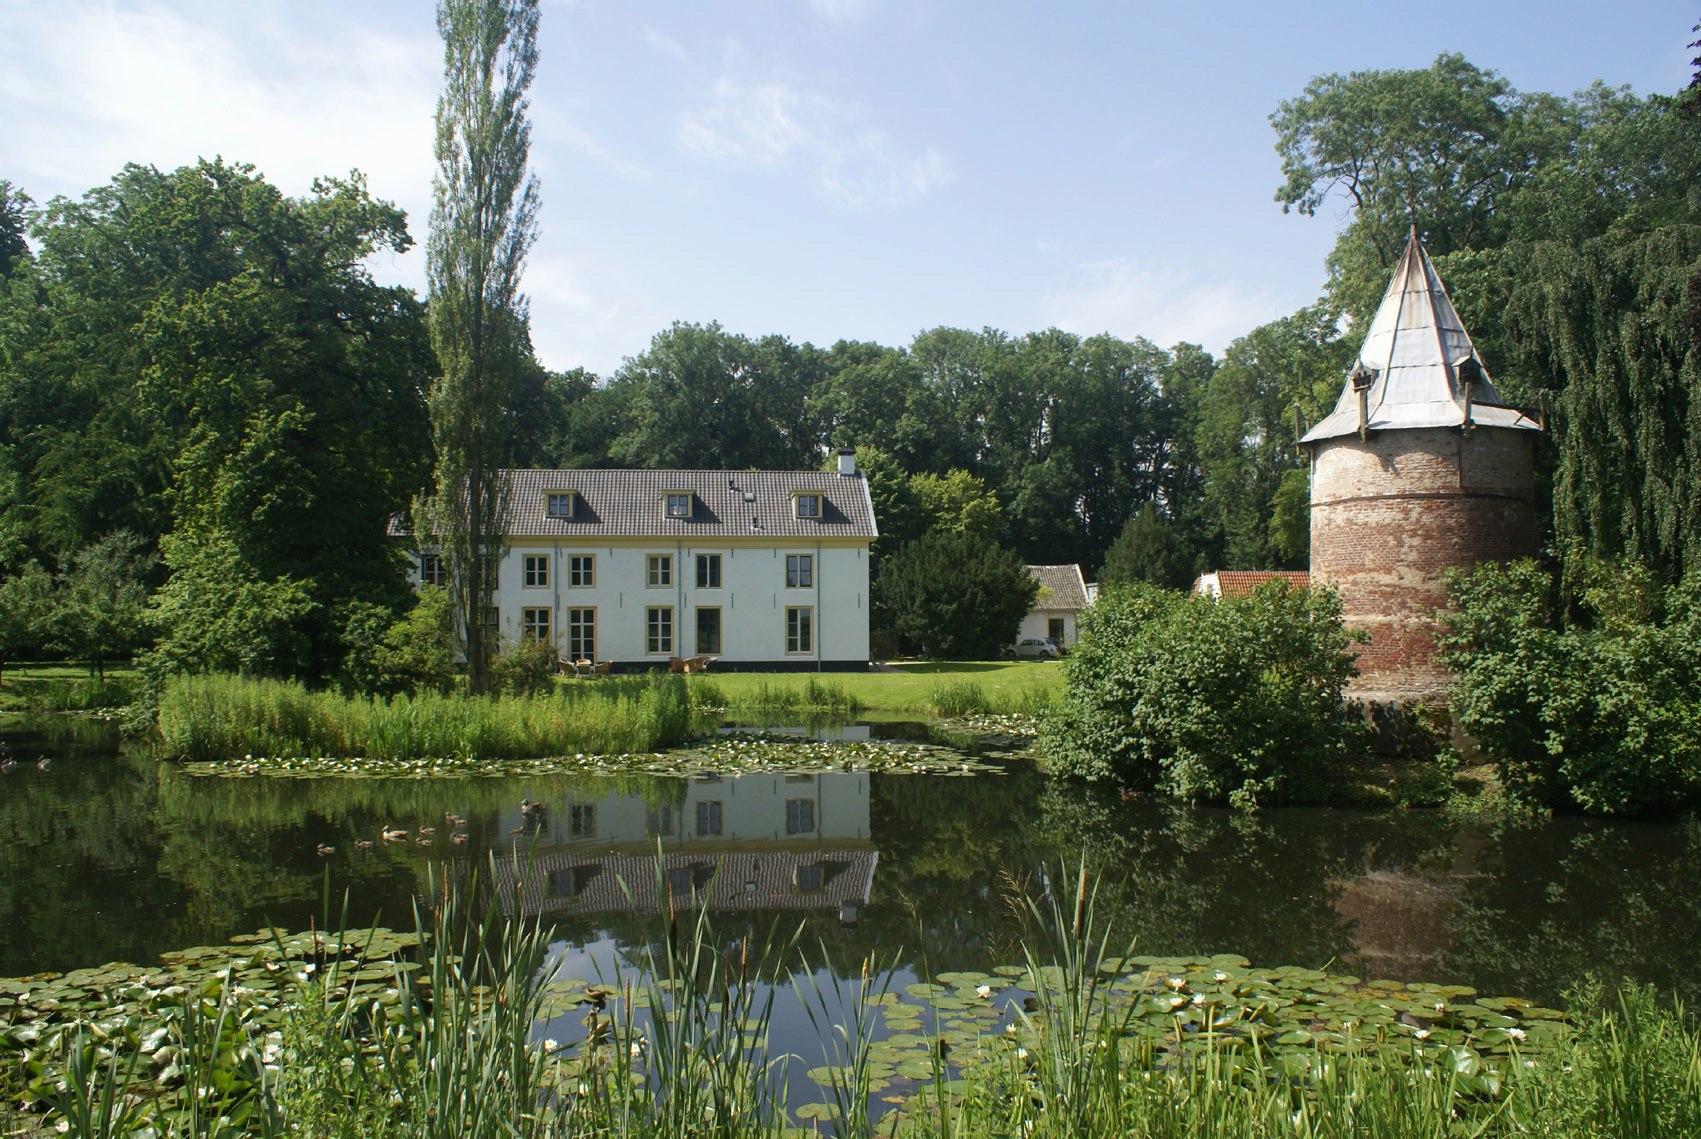 Landgoed wickenburgh - 't Goy